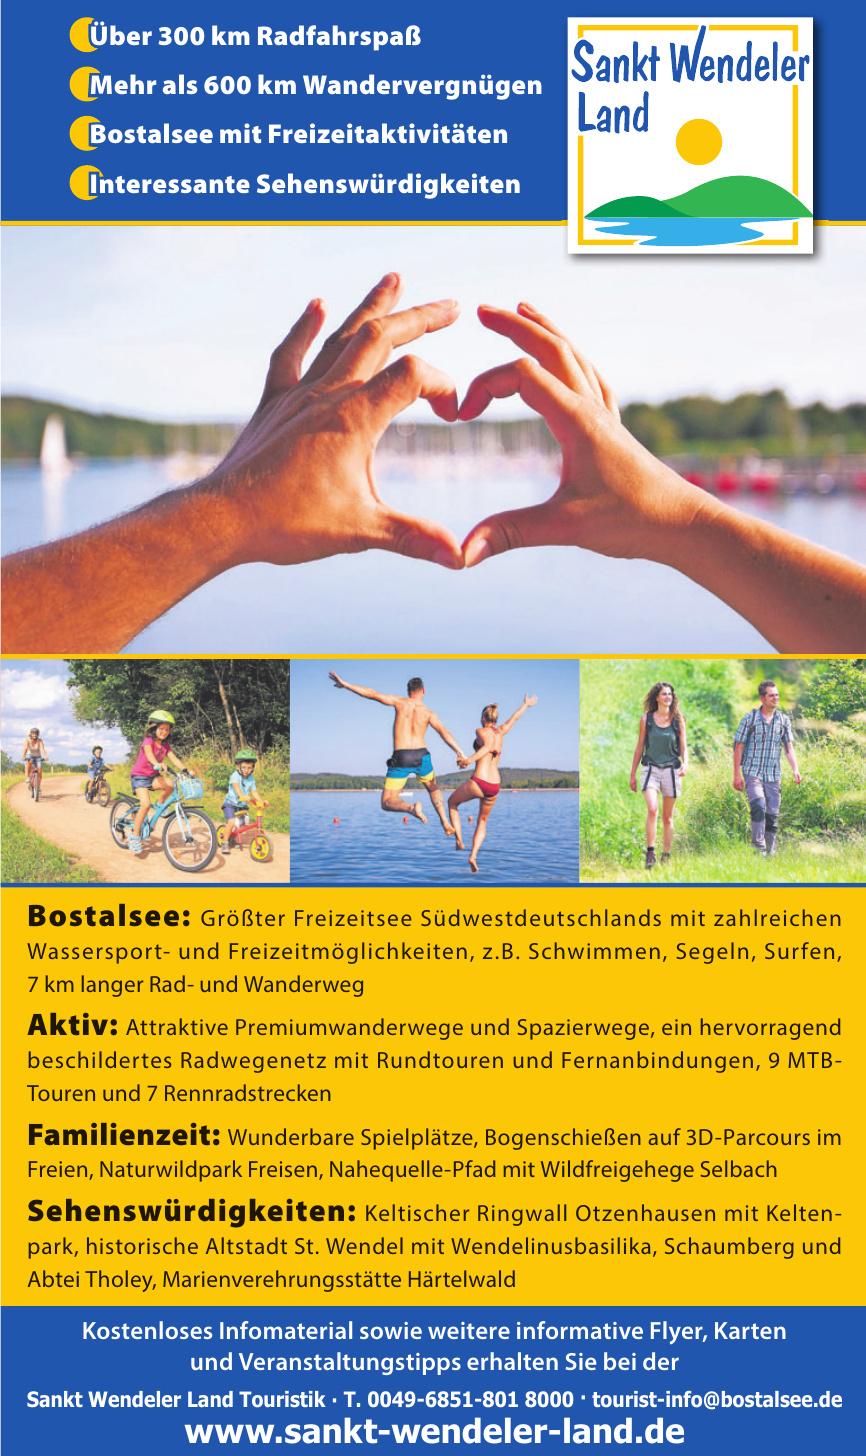 Tourist-Info Sankt Wendeler Land